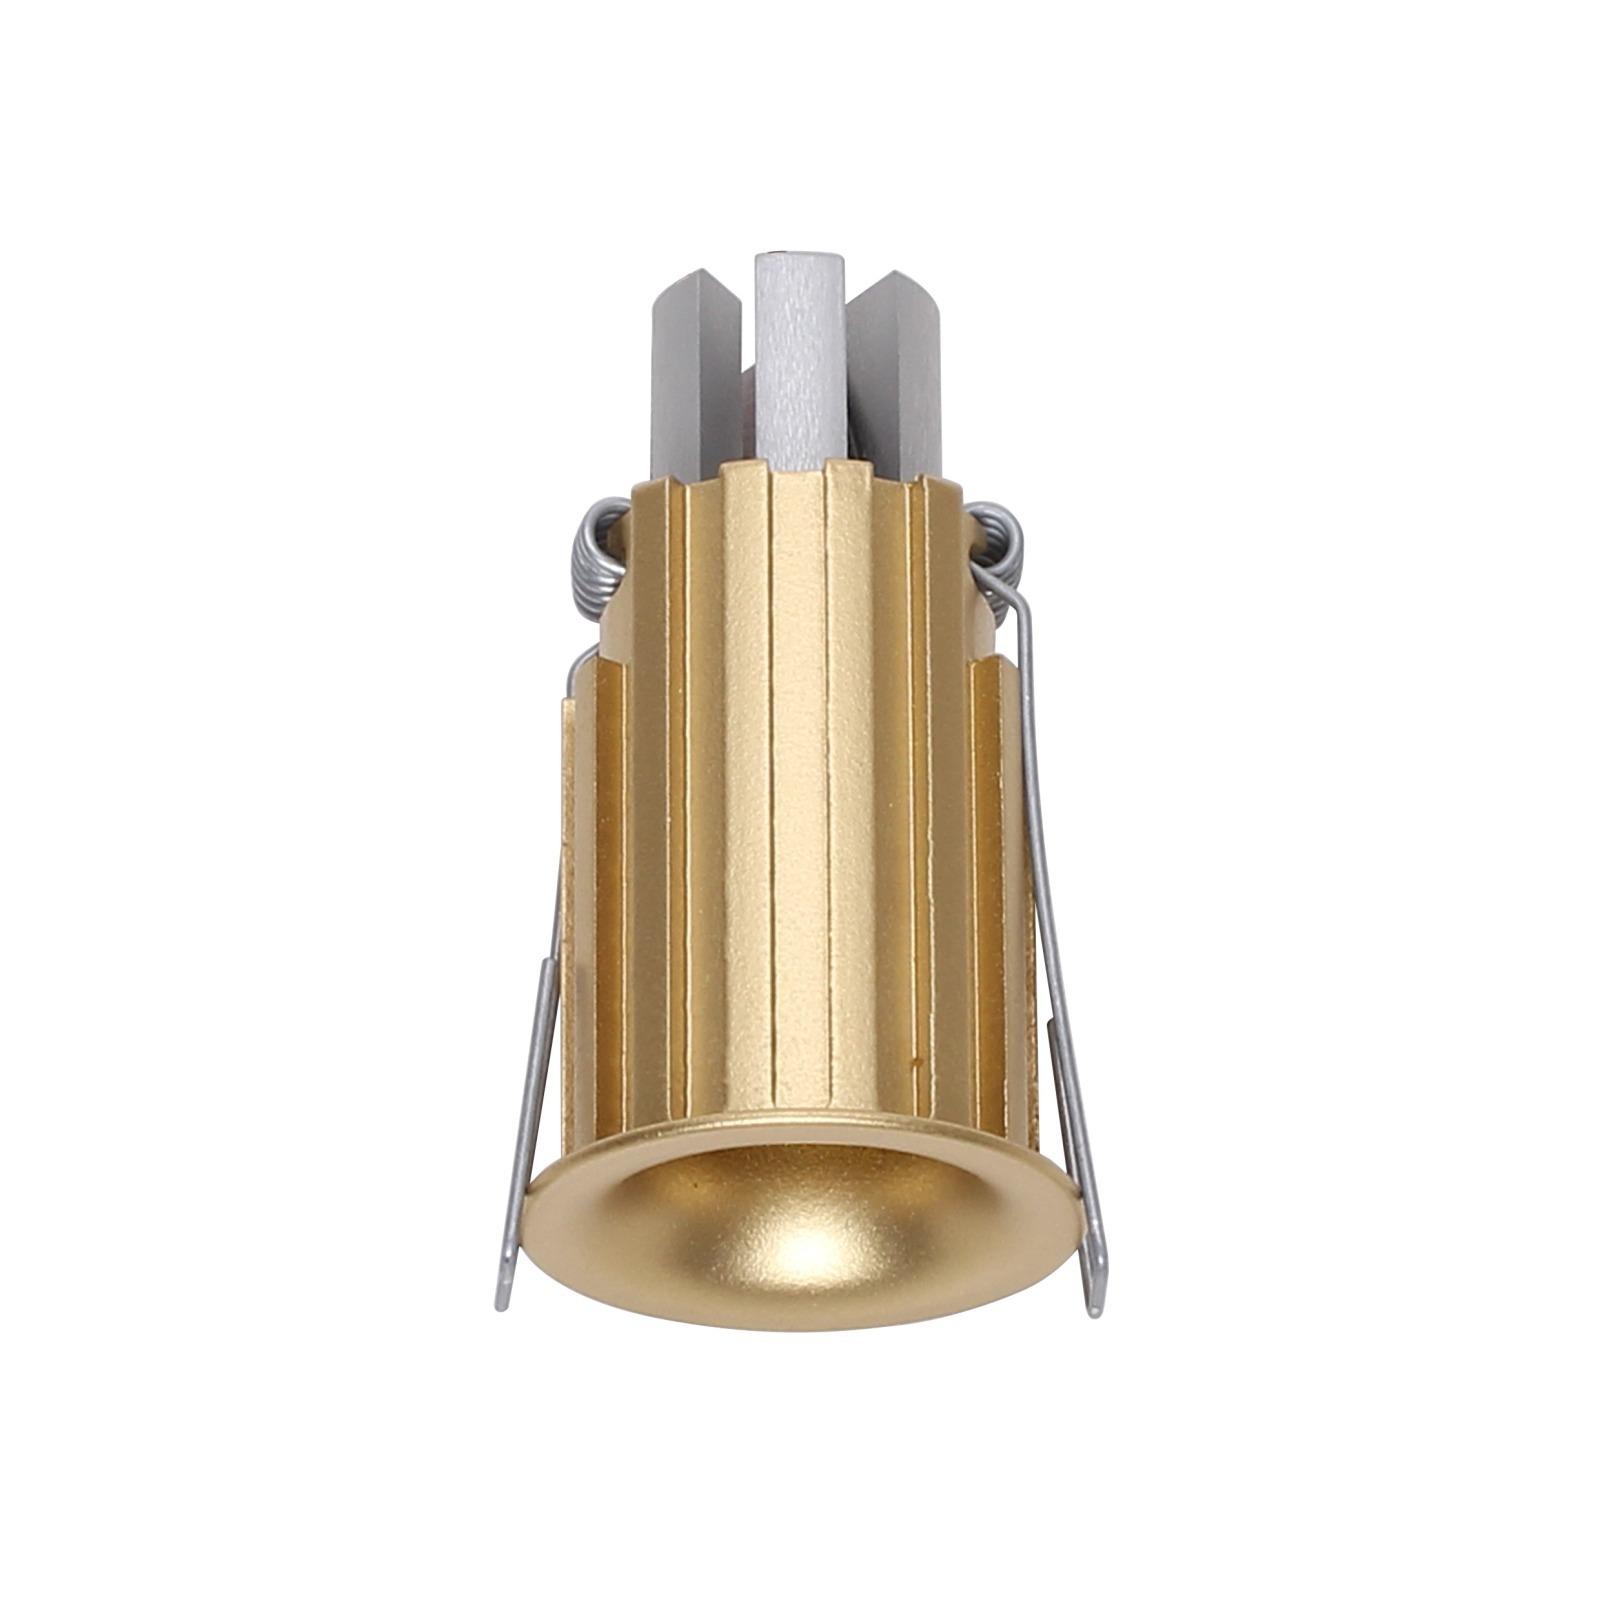 Linealight iled quantum downlight round powerled 6w 96434 - Downlight led para cocina ...